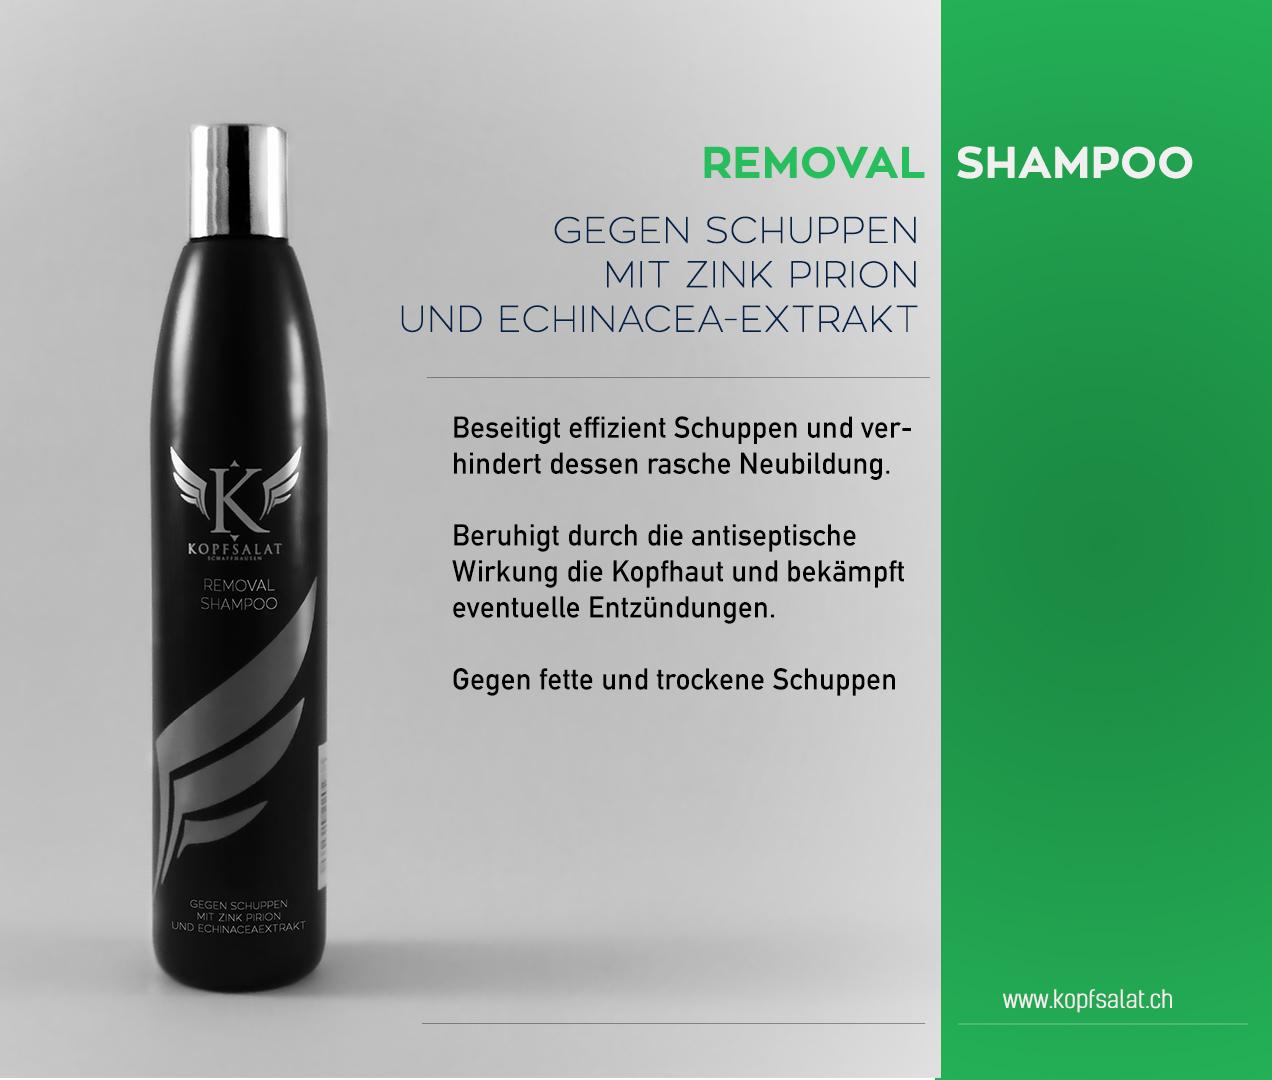 1 removal shampoo